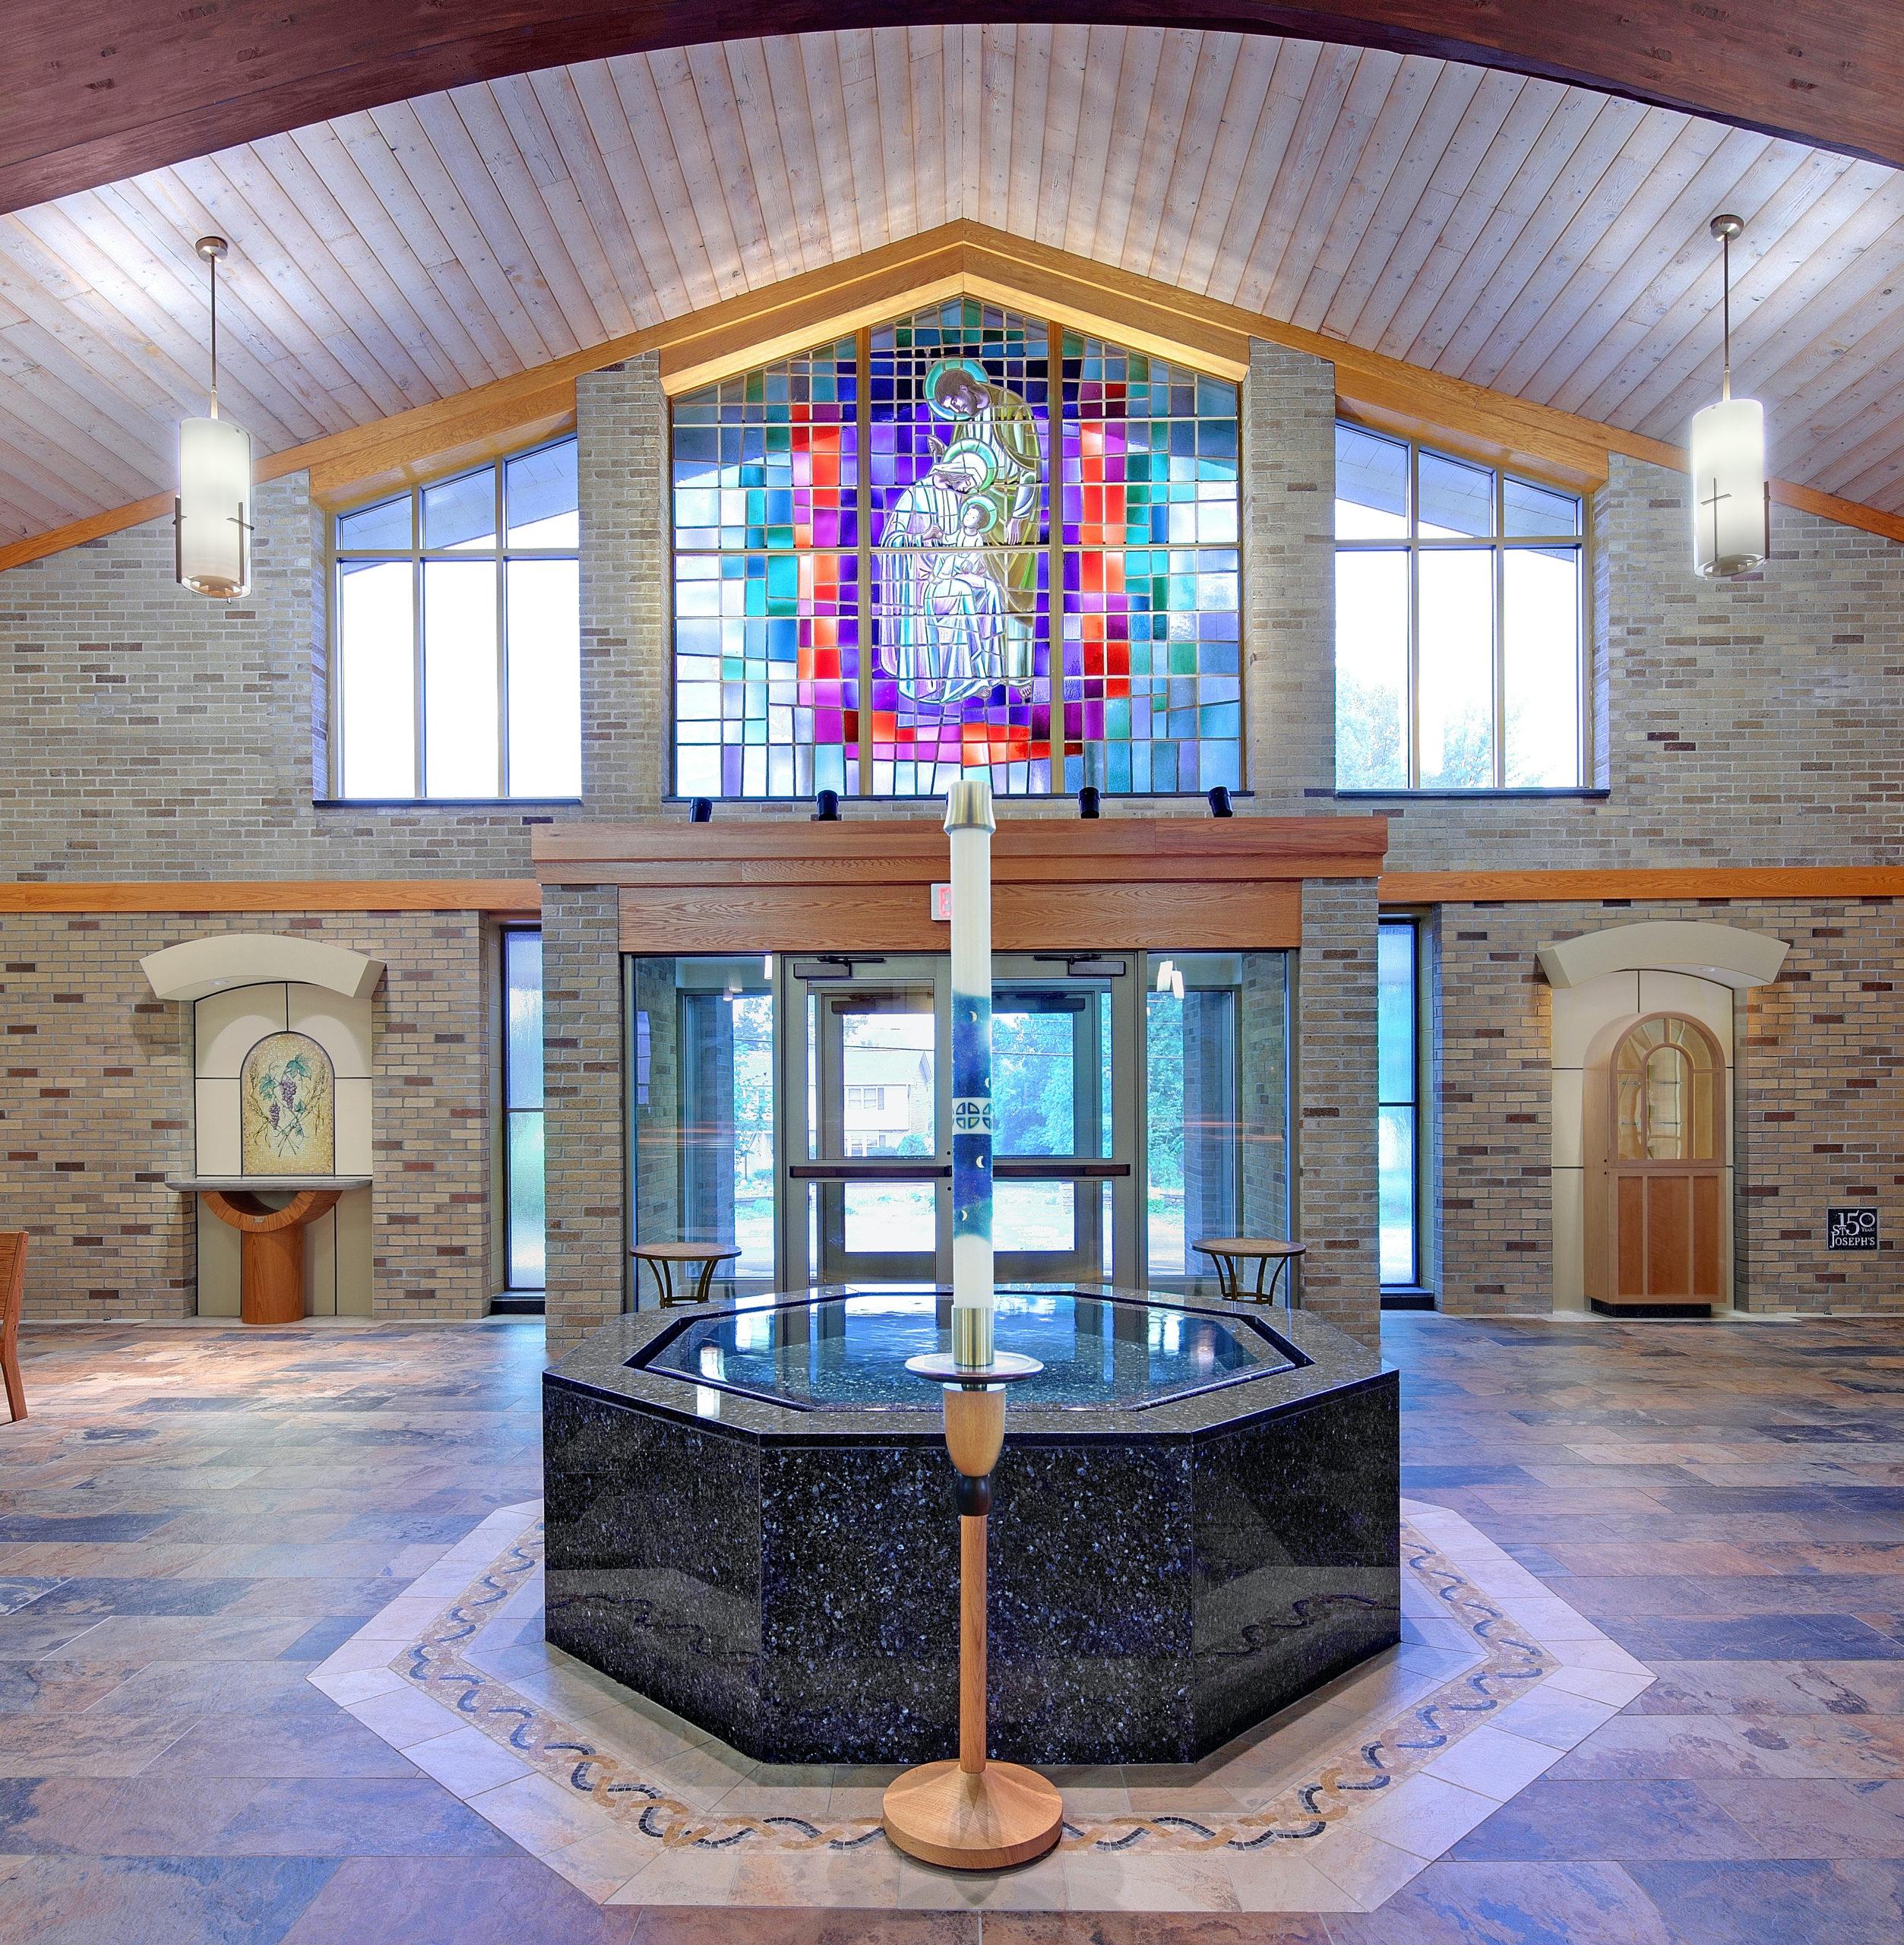 Single Level Octagonal Negative Edge Baptismal Font Pool, St. Joseph's Church, Penfield, NY.